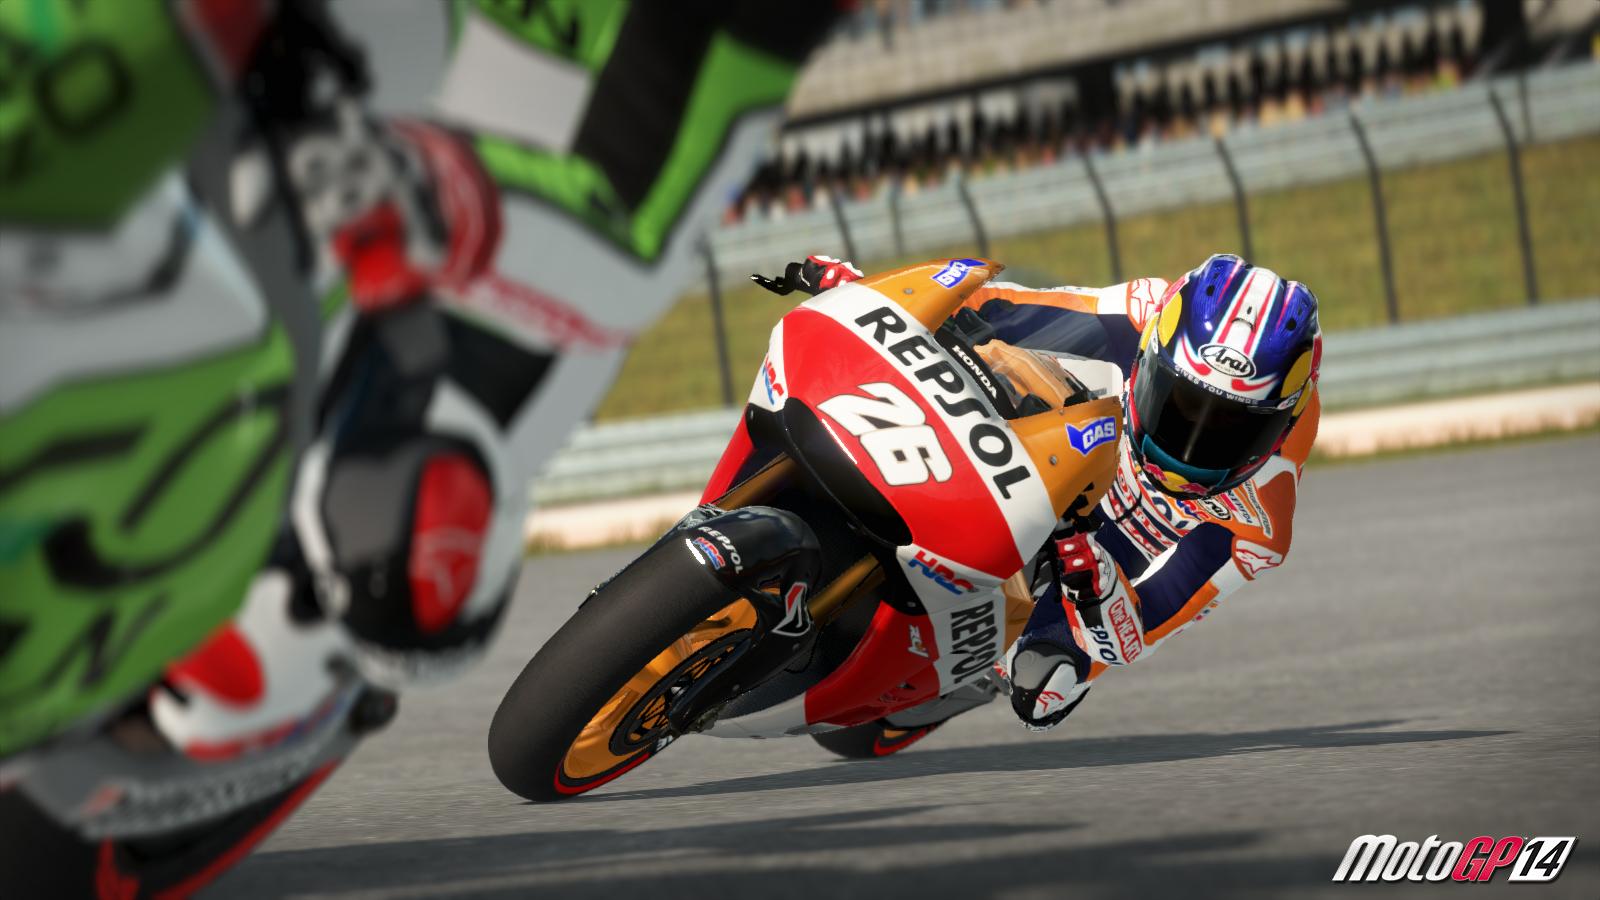 MotoGP 14 Multilenguaje ESPAÑOL XBOX 360 (Región NTSC-U/PAL) 9